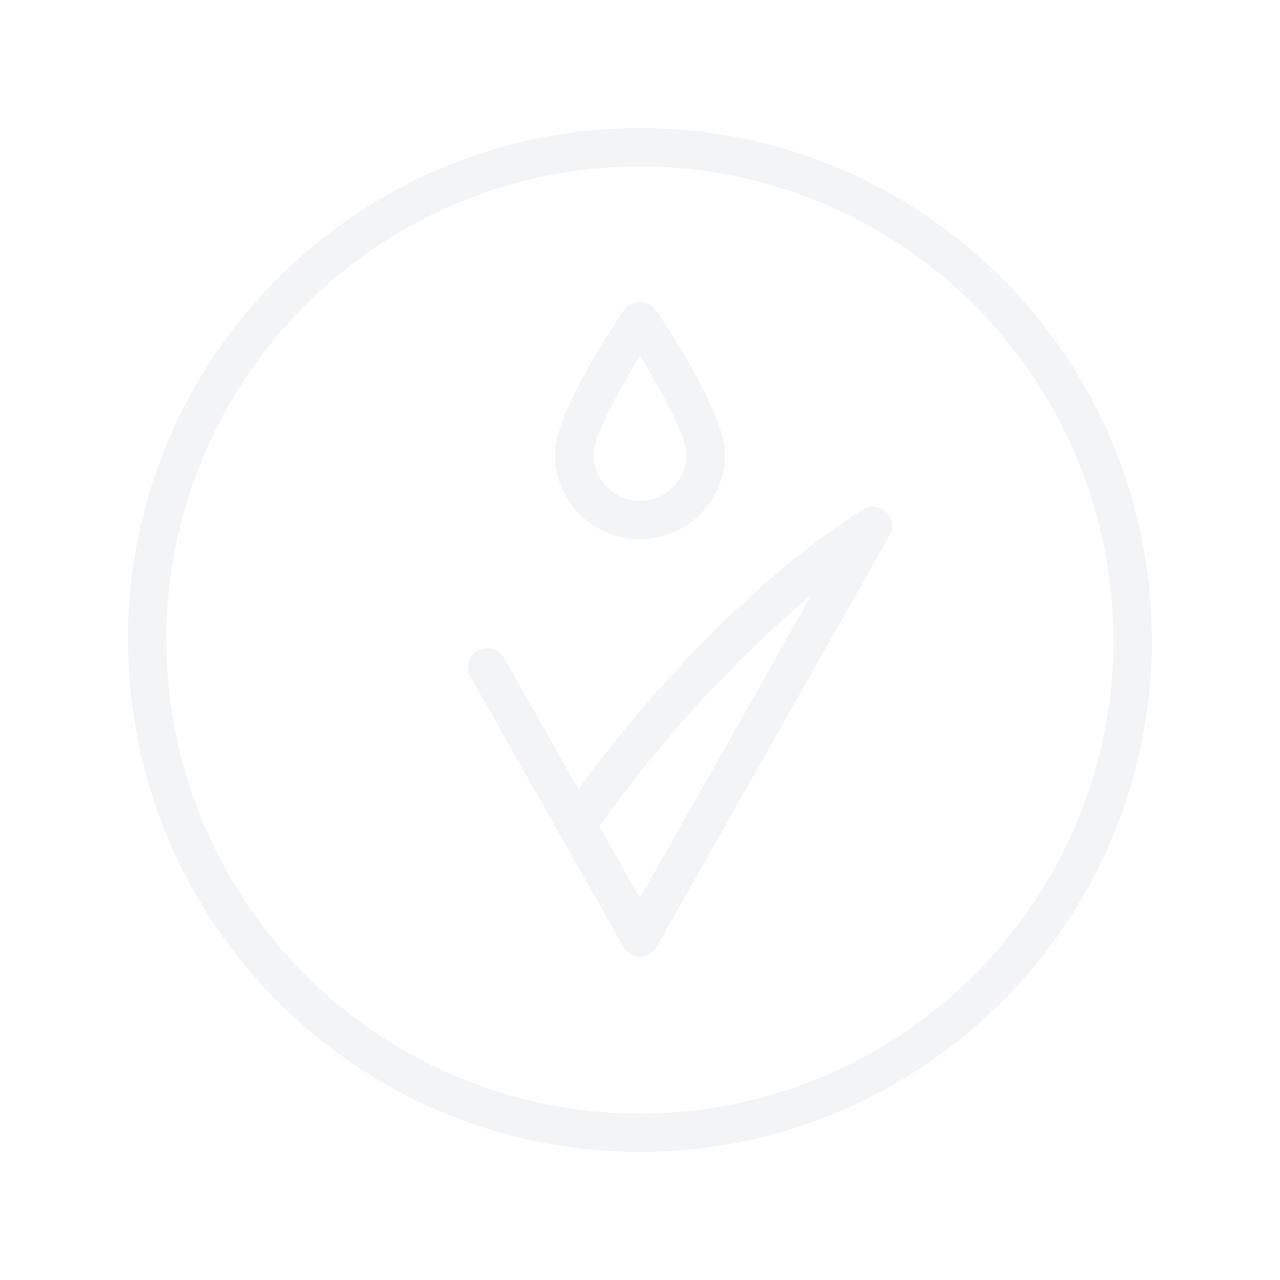 LANCASTER 365 Skin Repair Youth Memory Night Cream 50ml